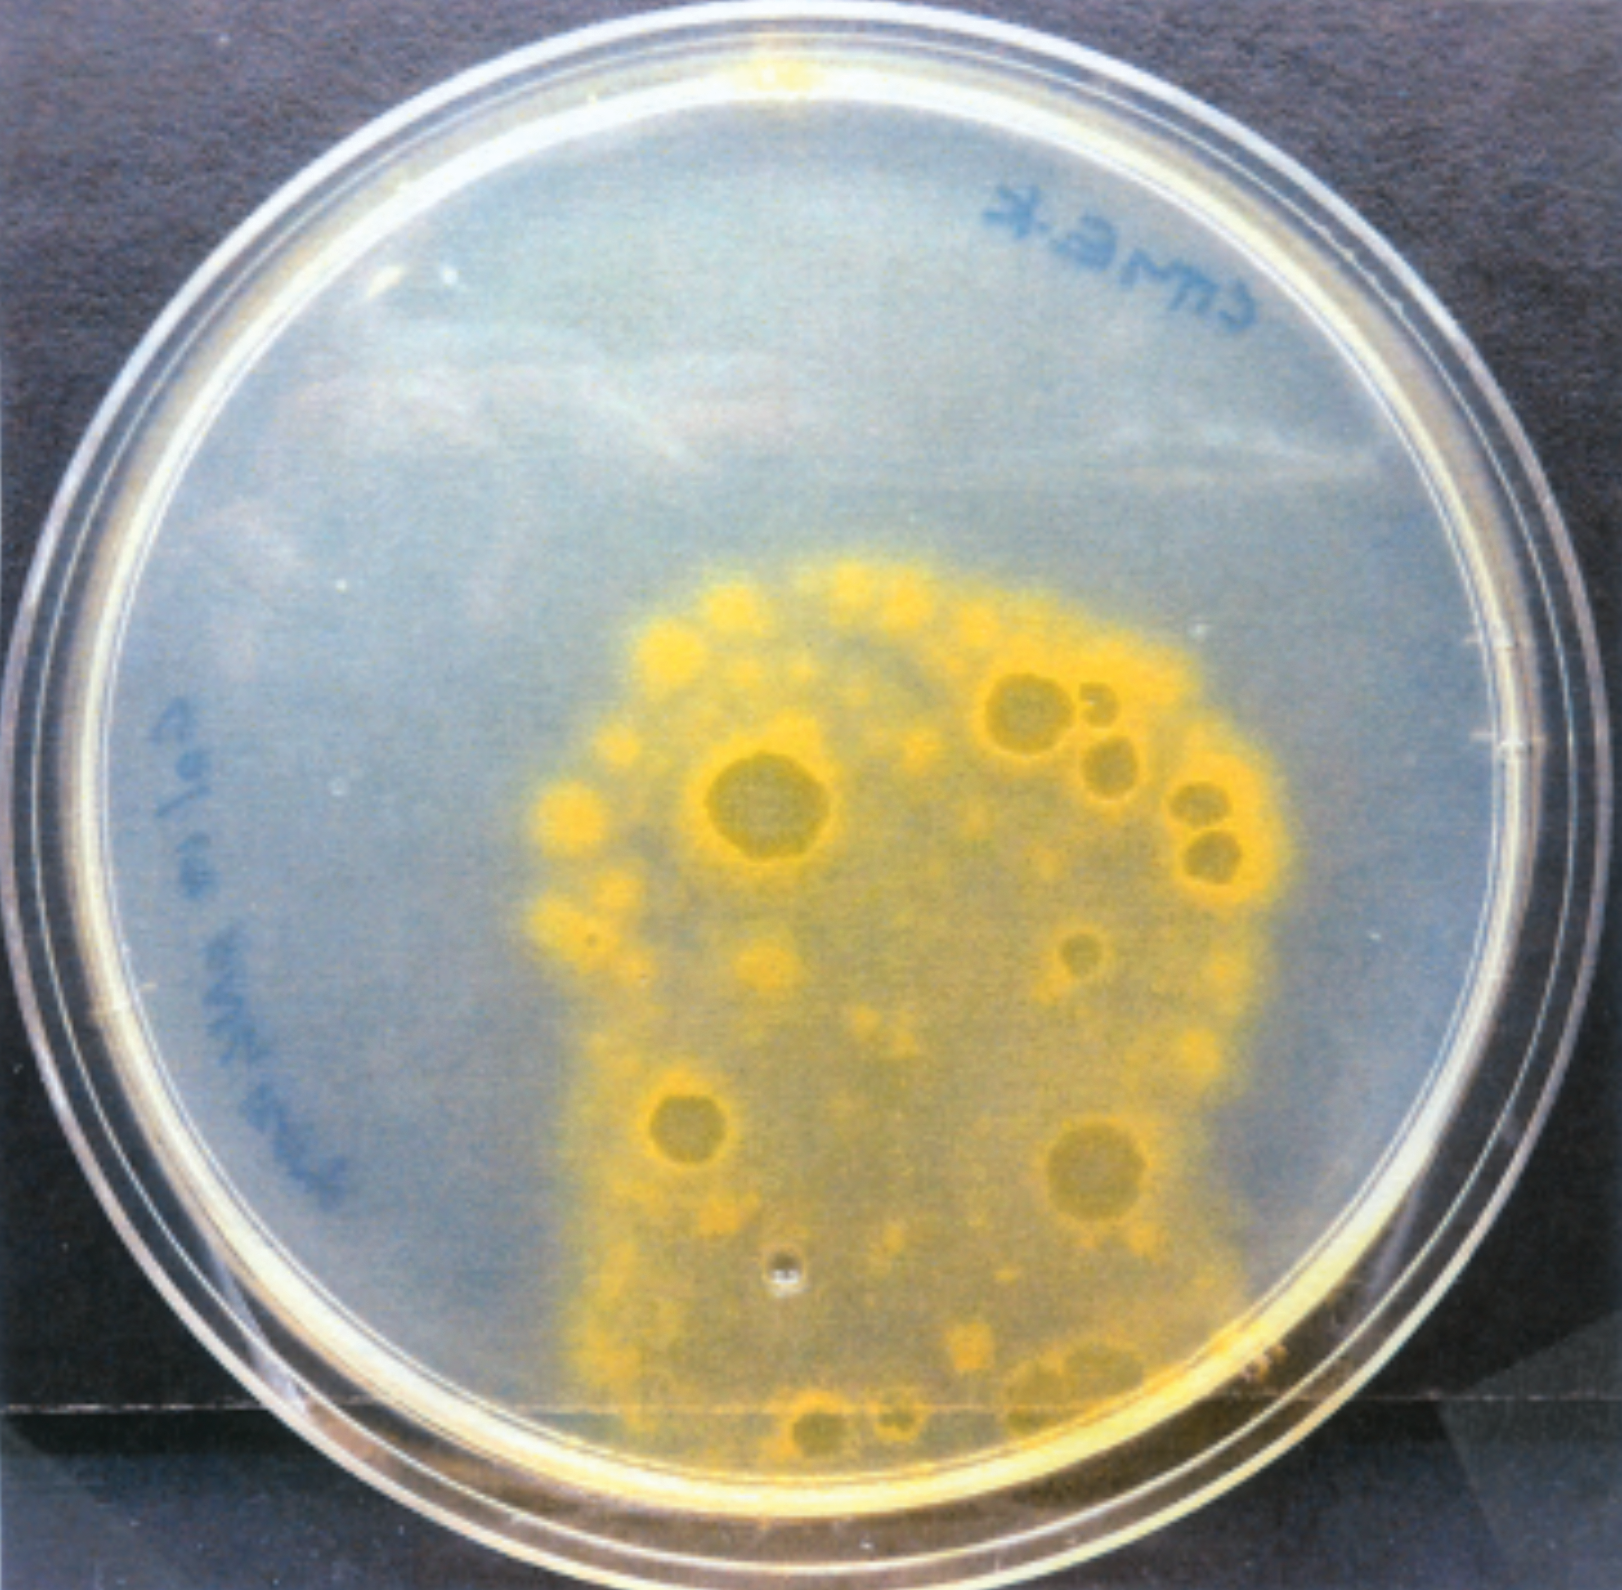 Bacteria Harbor Geometric